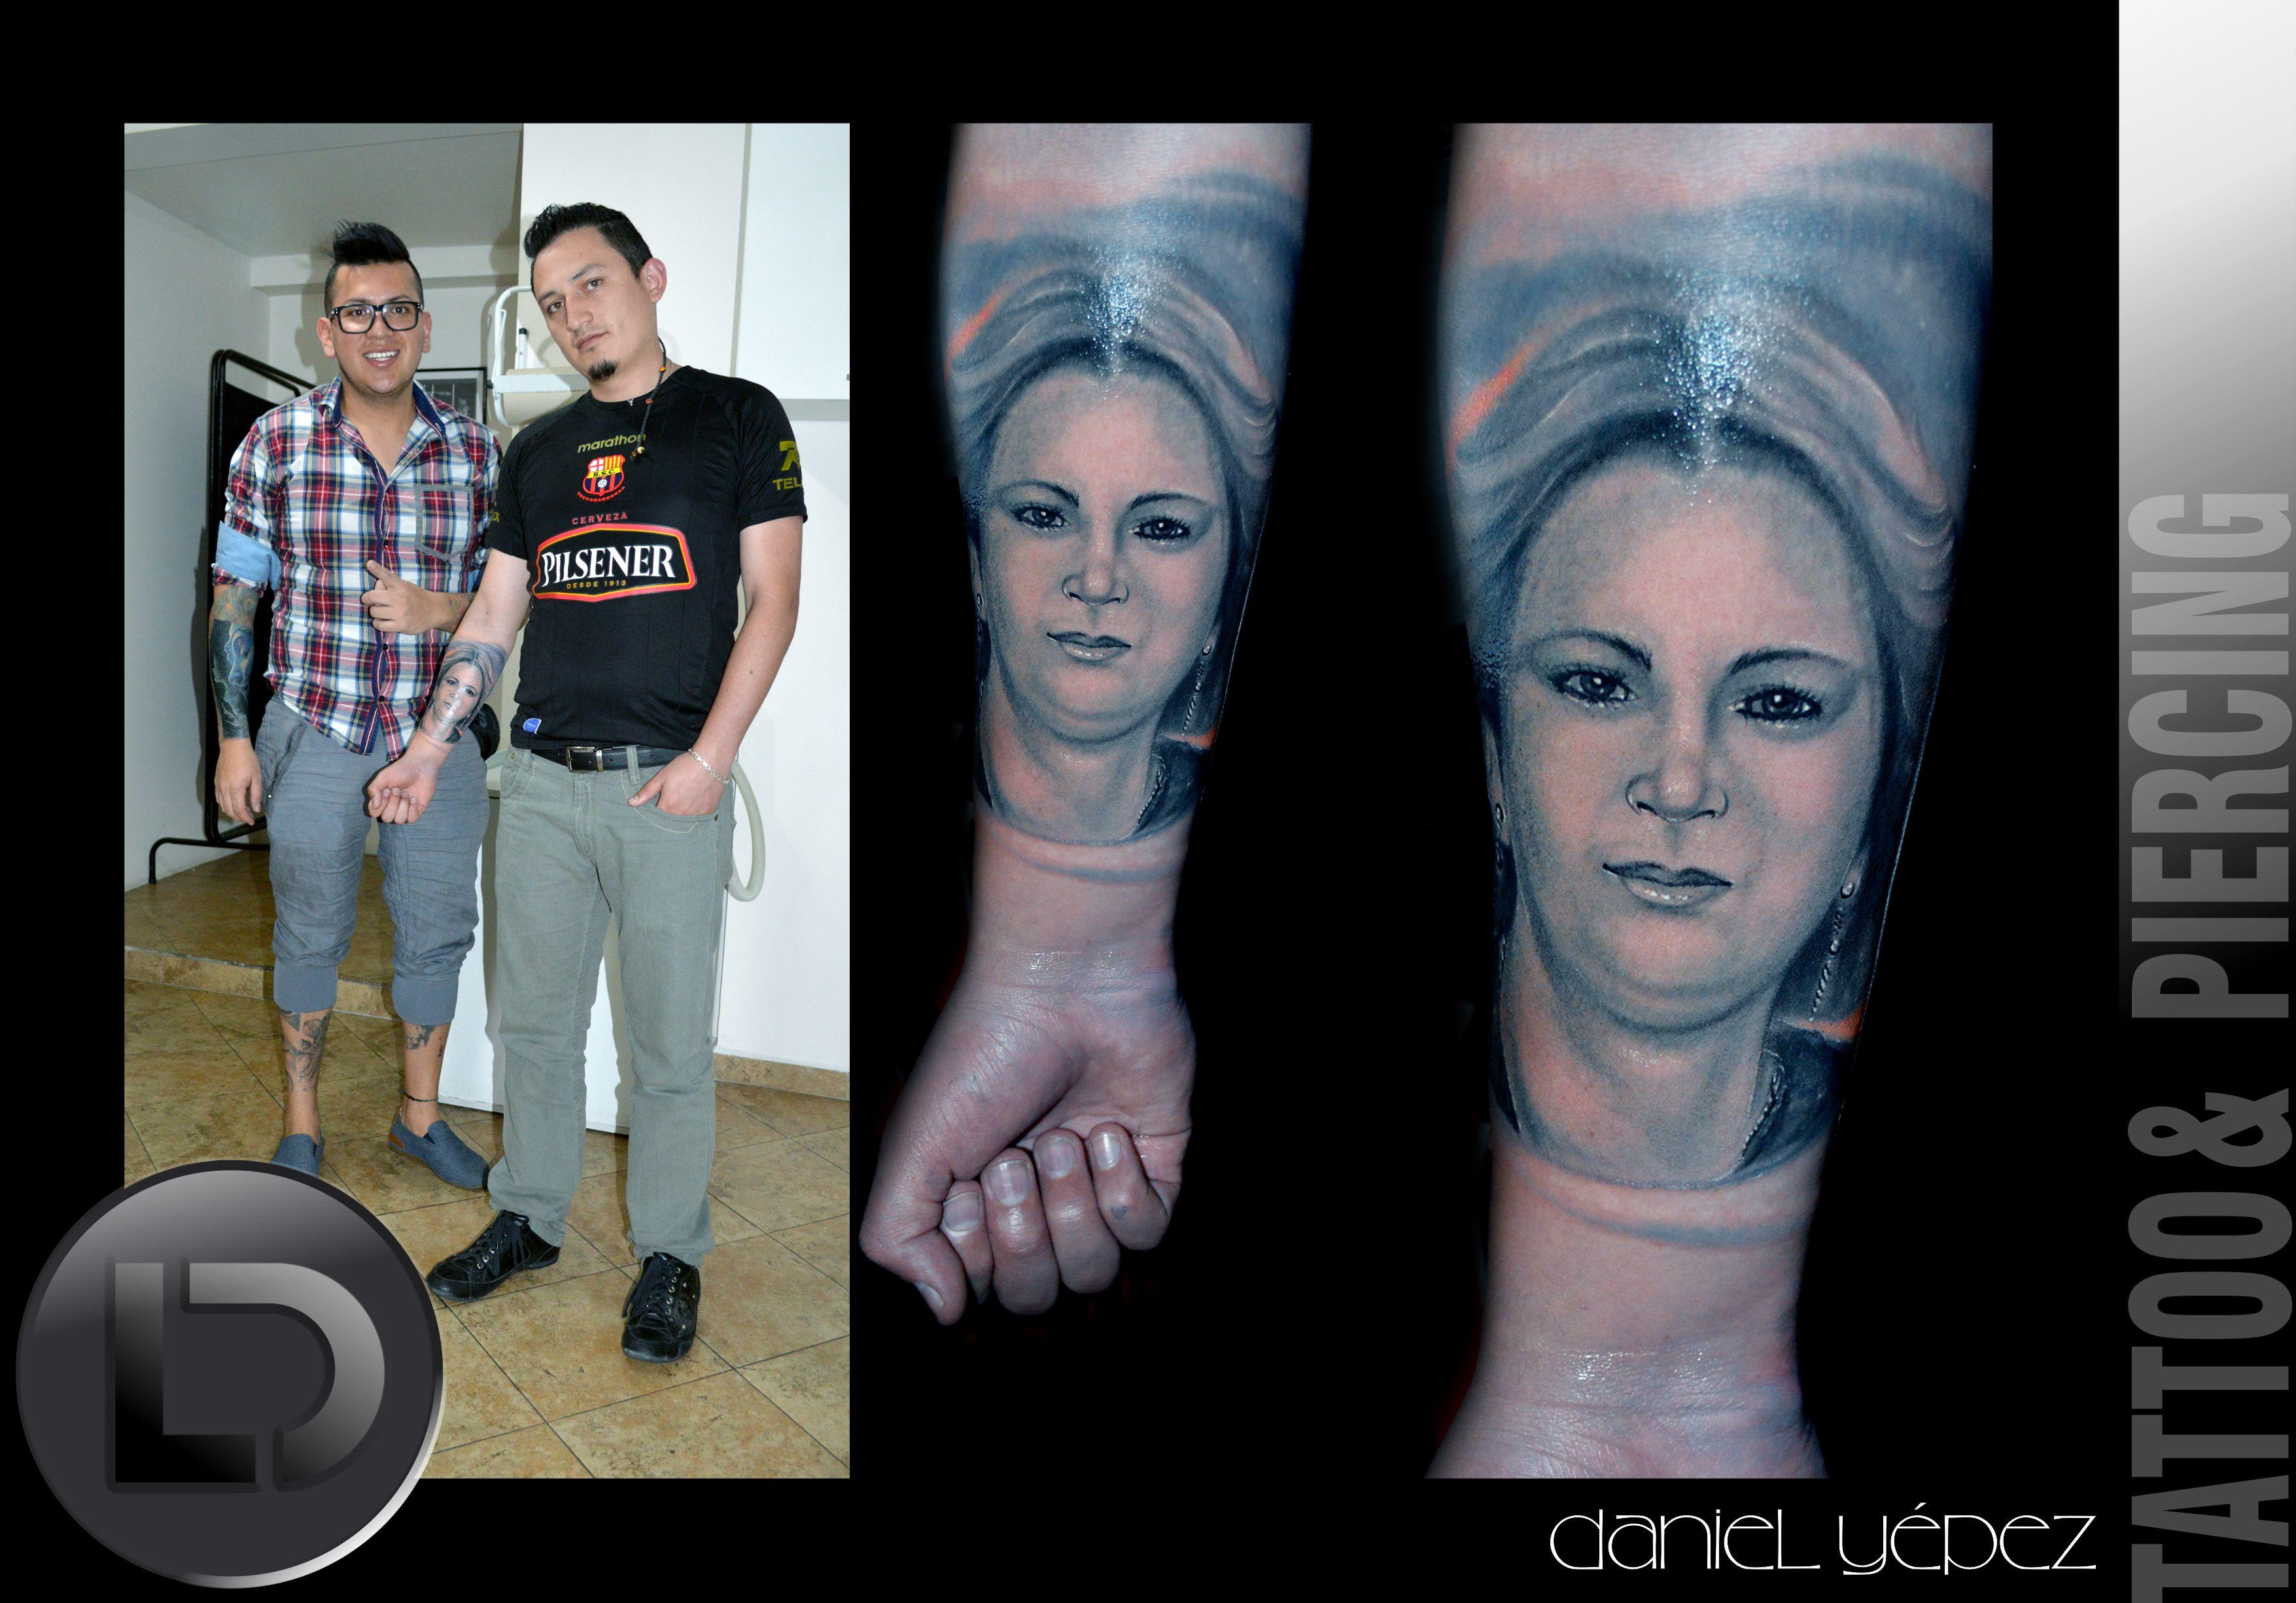 Portrait tattoo color   Artista Daniel Yepez  Estamos ubicados en Quito- Ecuador Carrión Oe-123 y 10 de agosto cerca de almacenes la Ganga local de fachada negra  Whatsapp 0989812096(Claro) mail: tattookdt@hotmail.com Te esperamos Lunes a Sábado de 10:00 a 8:00pm